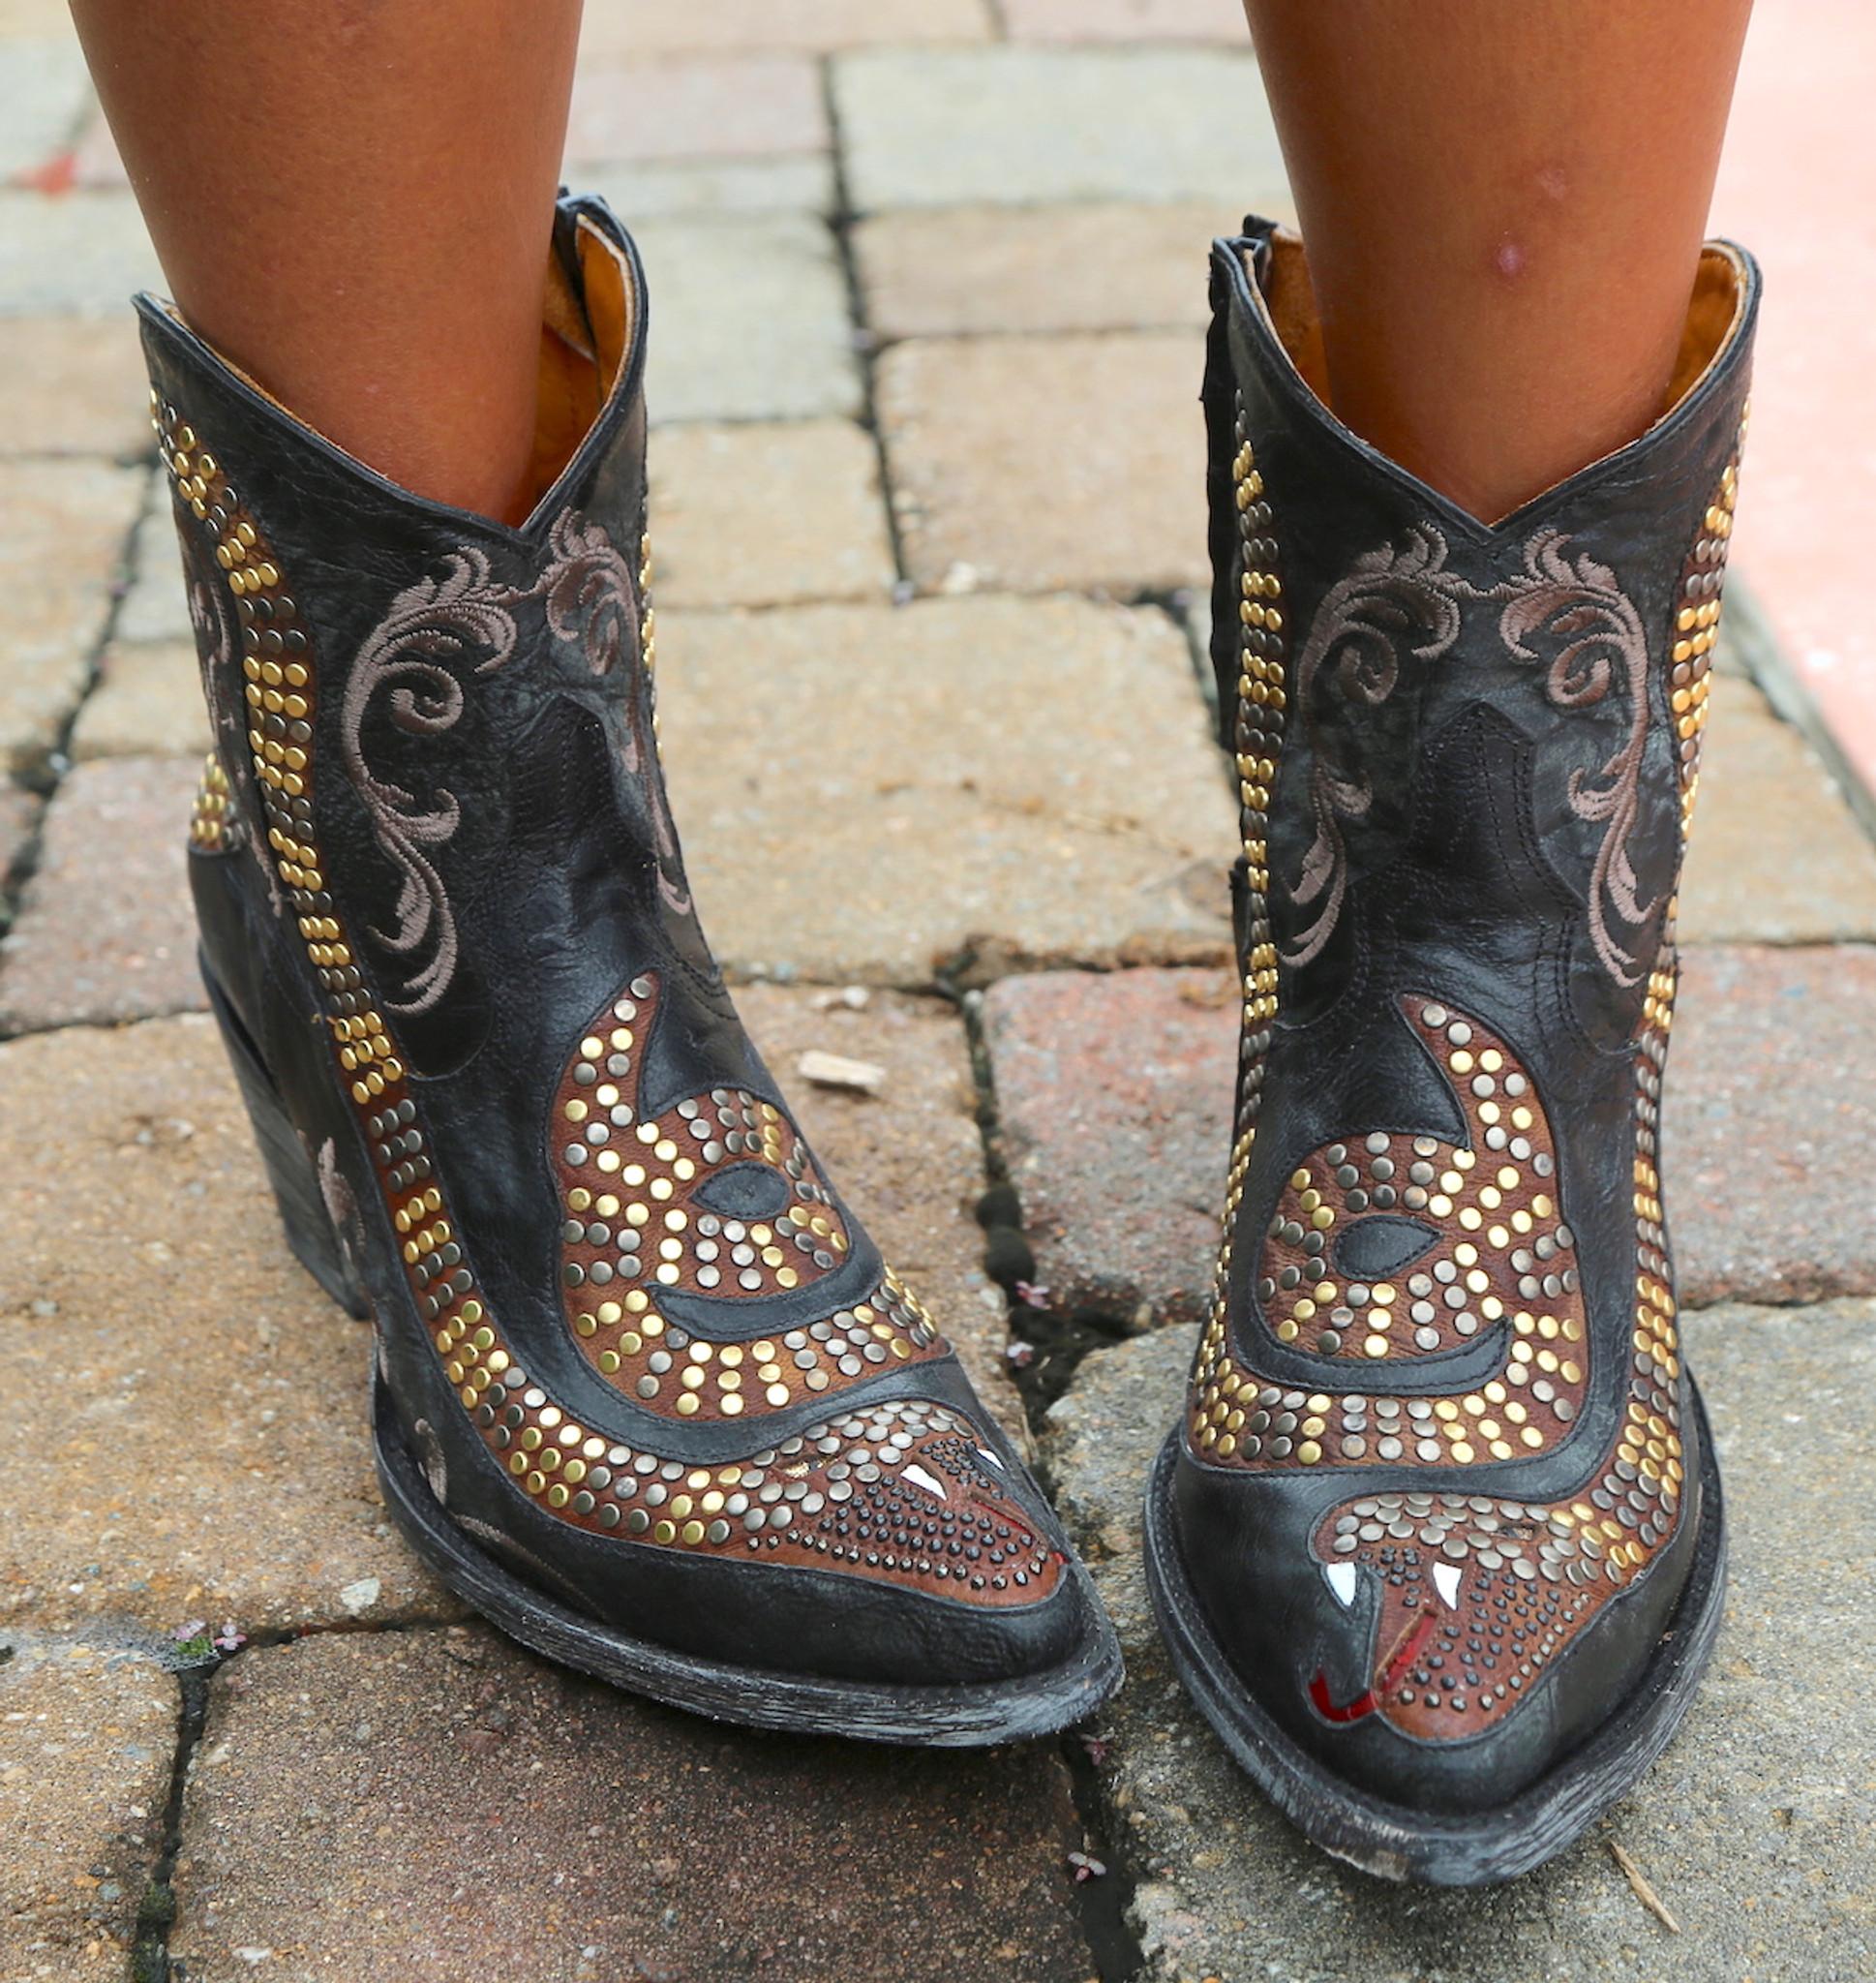 Old Gringo Women's Boots